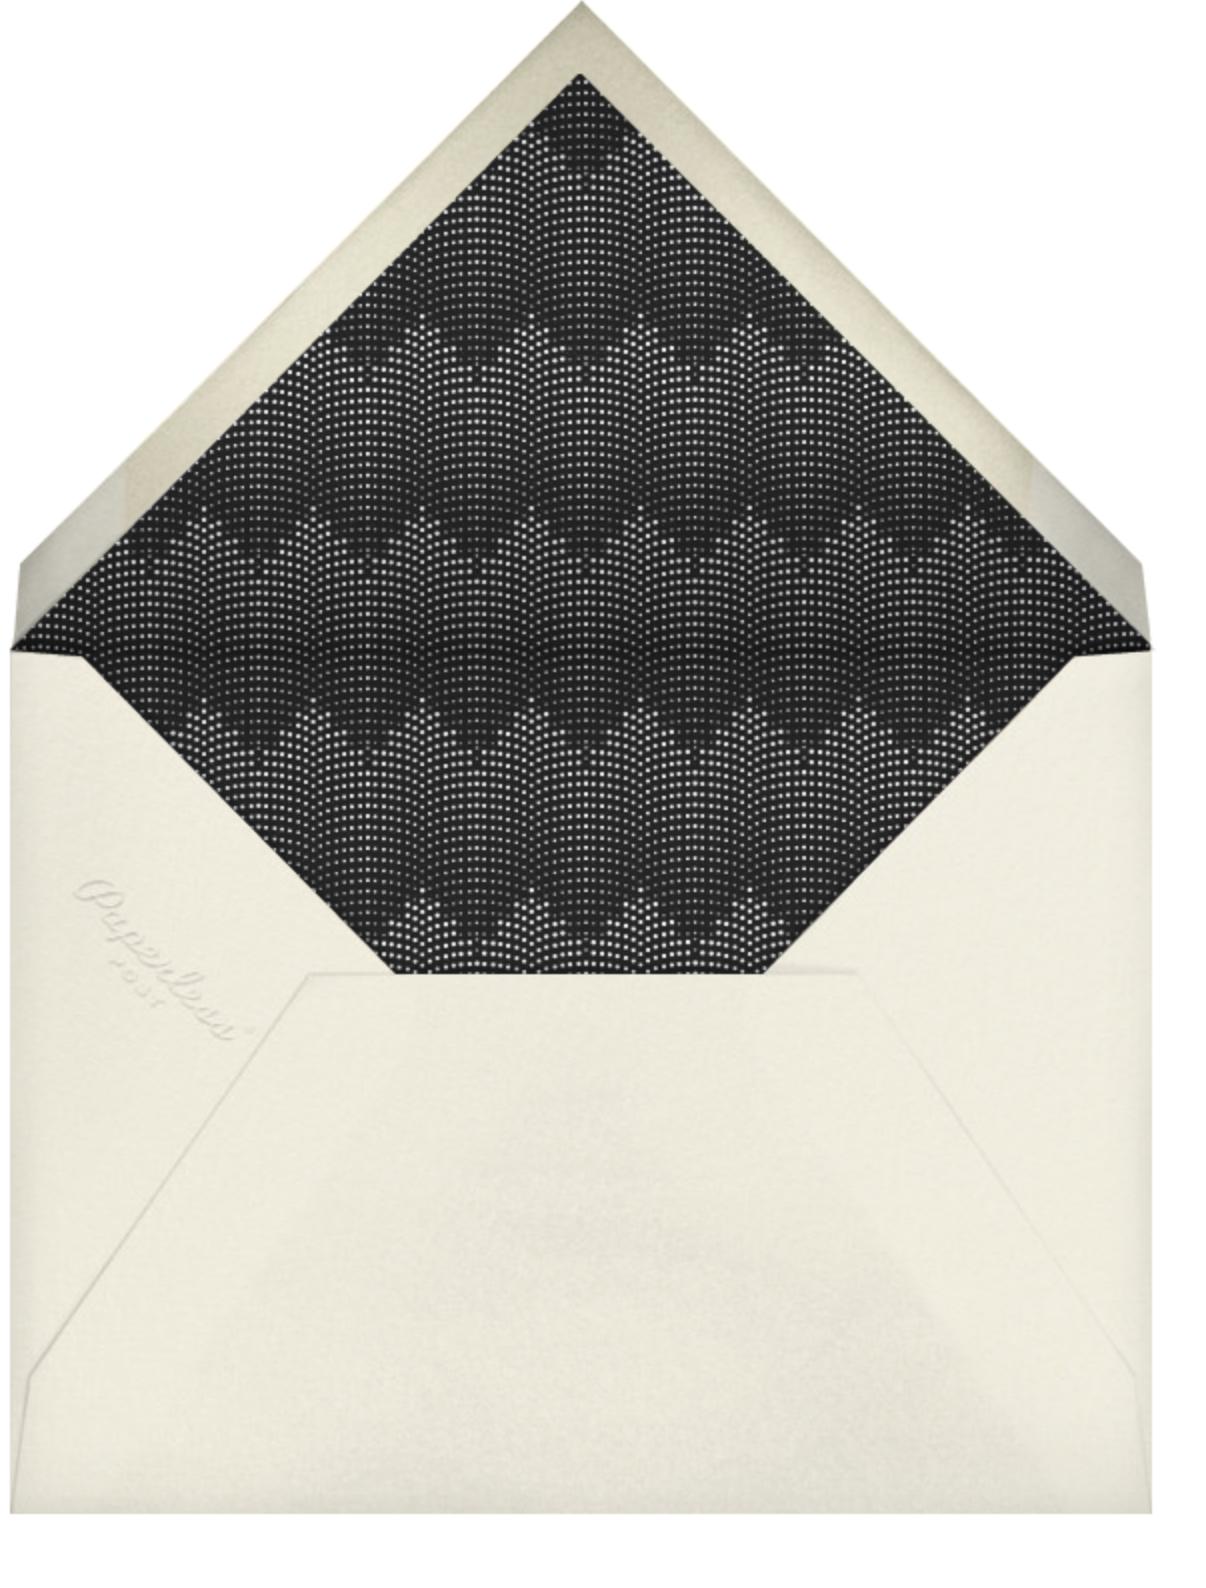 Rosina Photo - Black - Paperless Post - Engagement party - envelope back